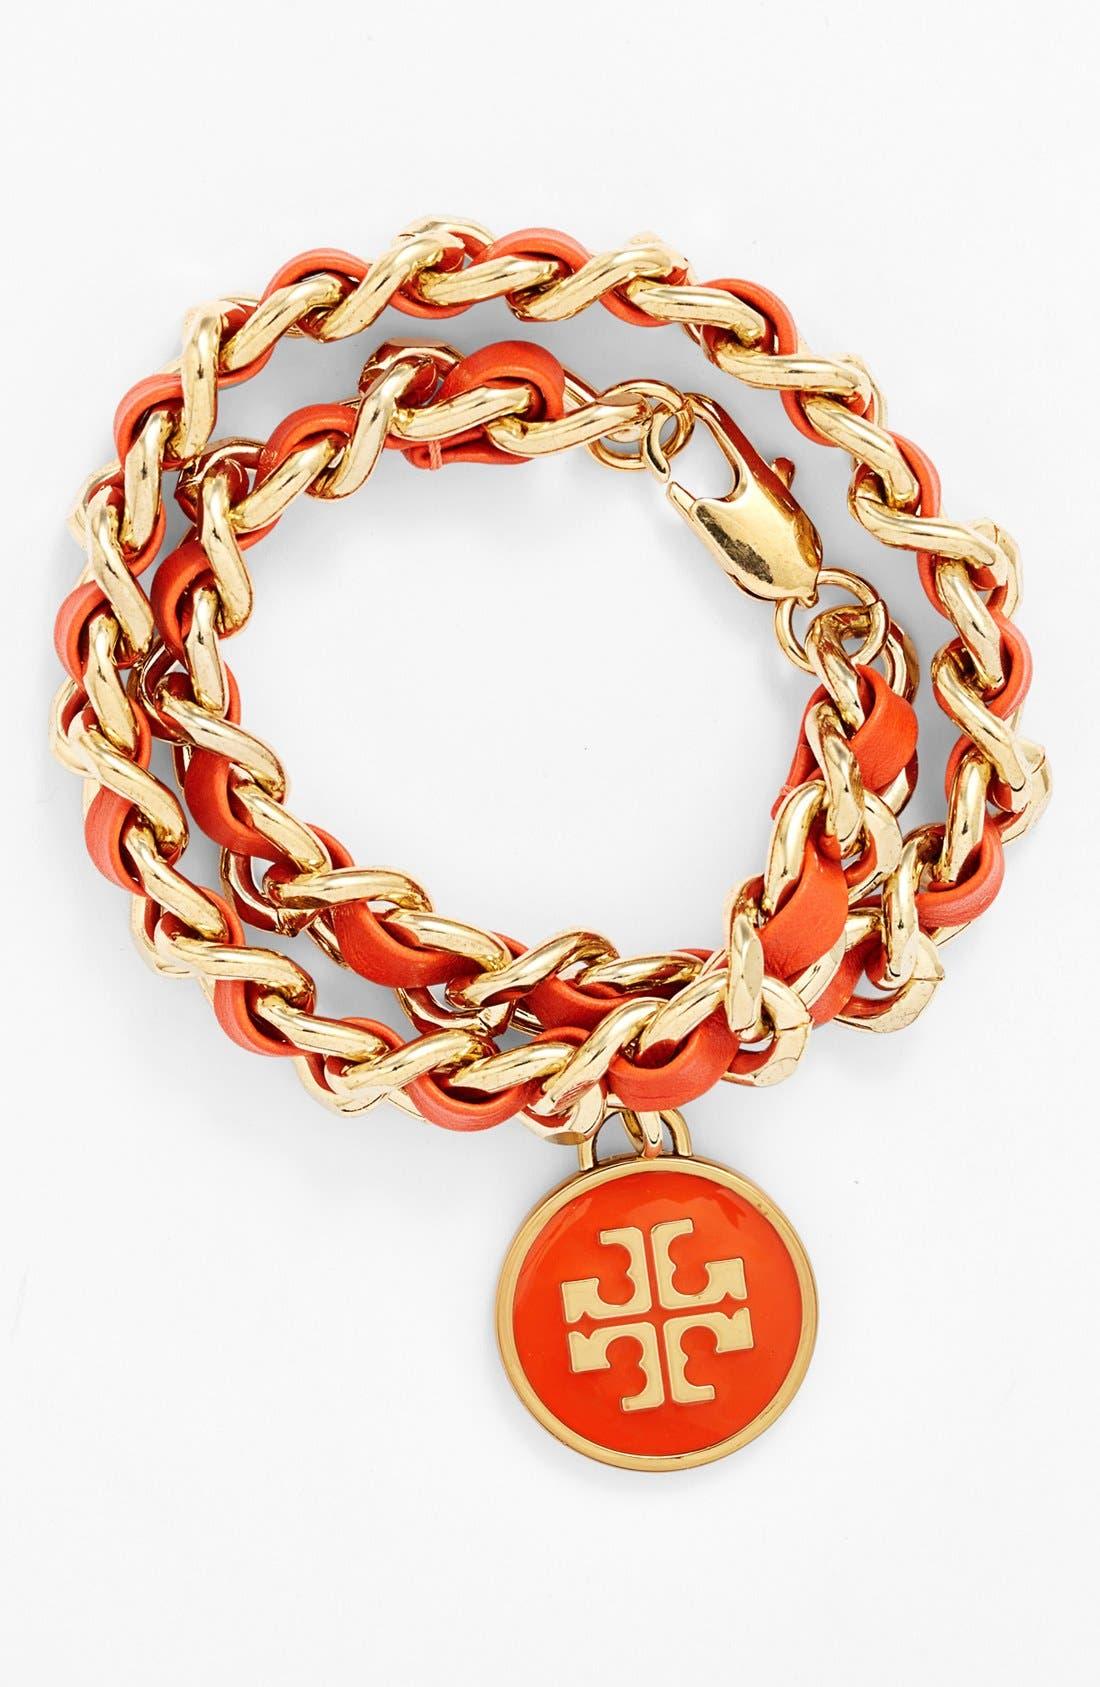 Alternate Image 1 Selected - Tory Burch Link & Leather Wrap Bracelet